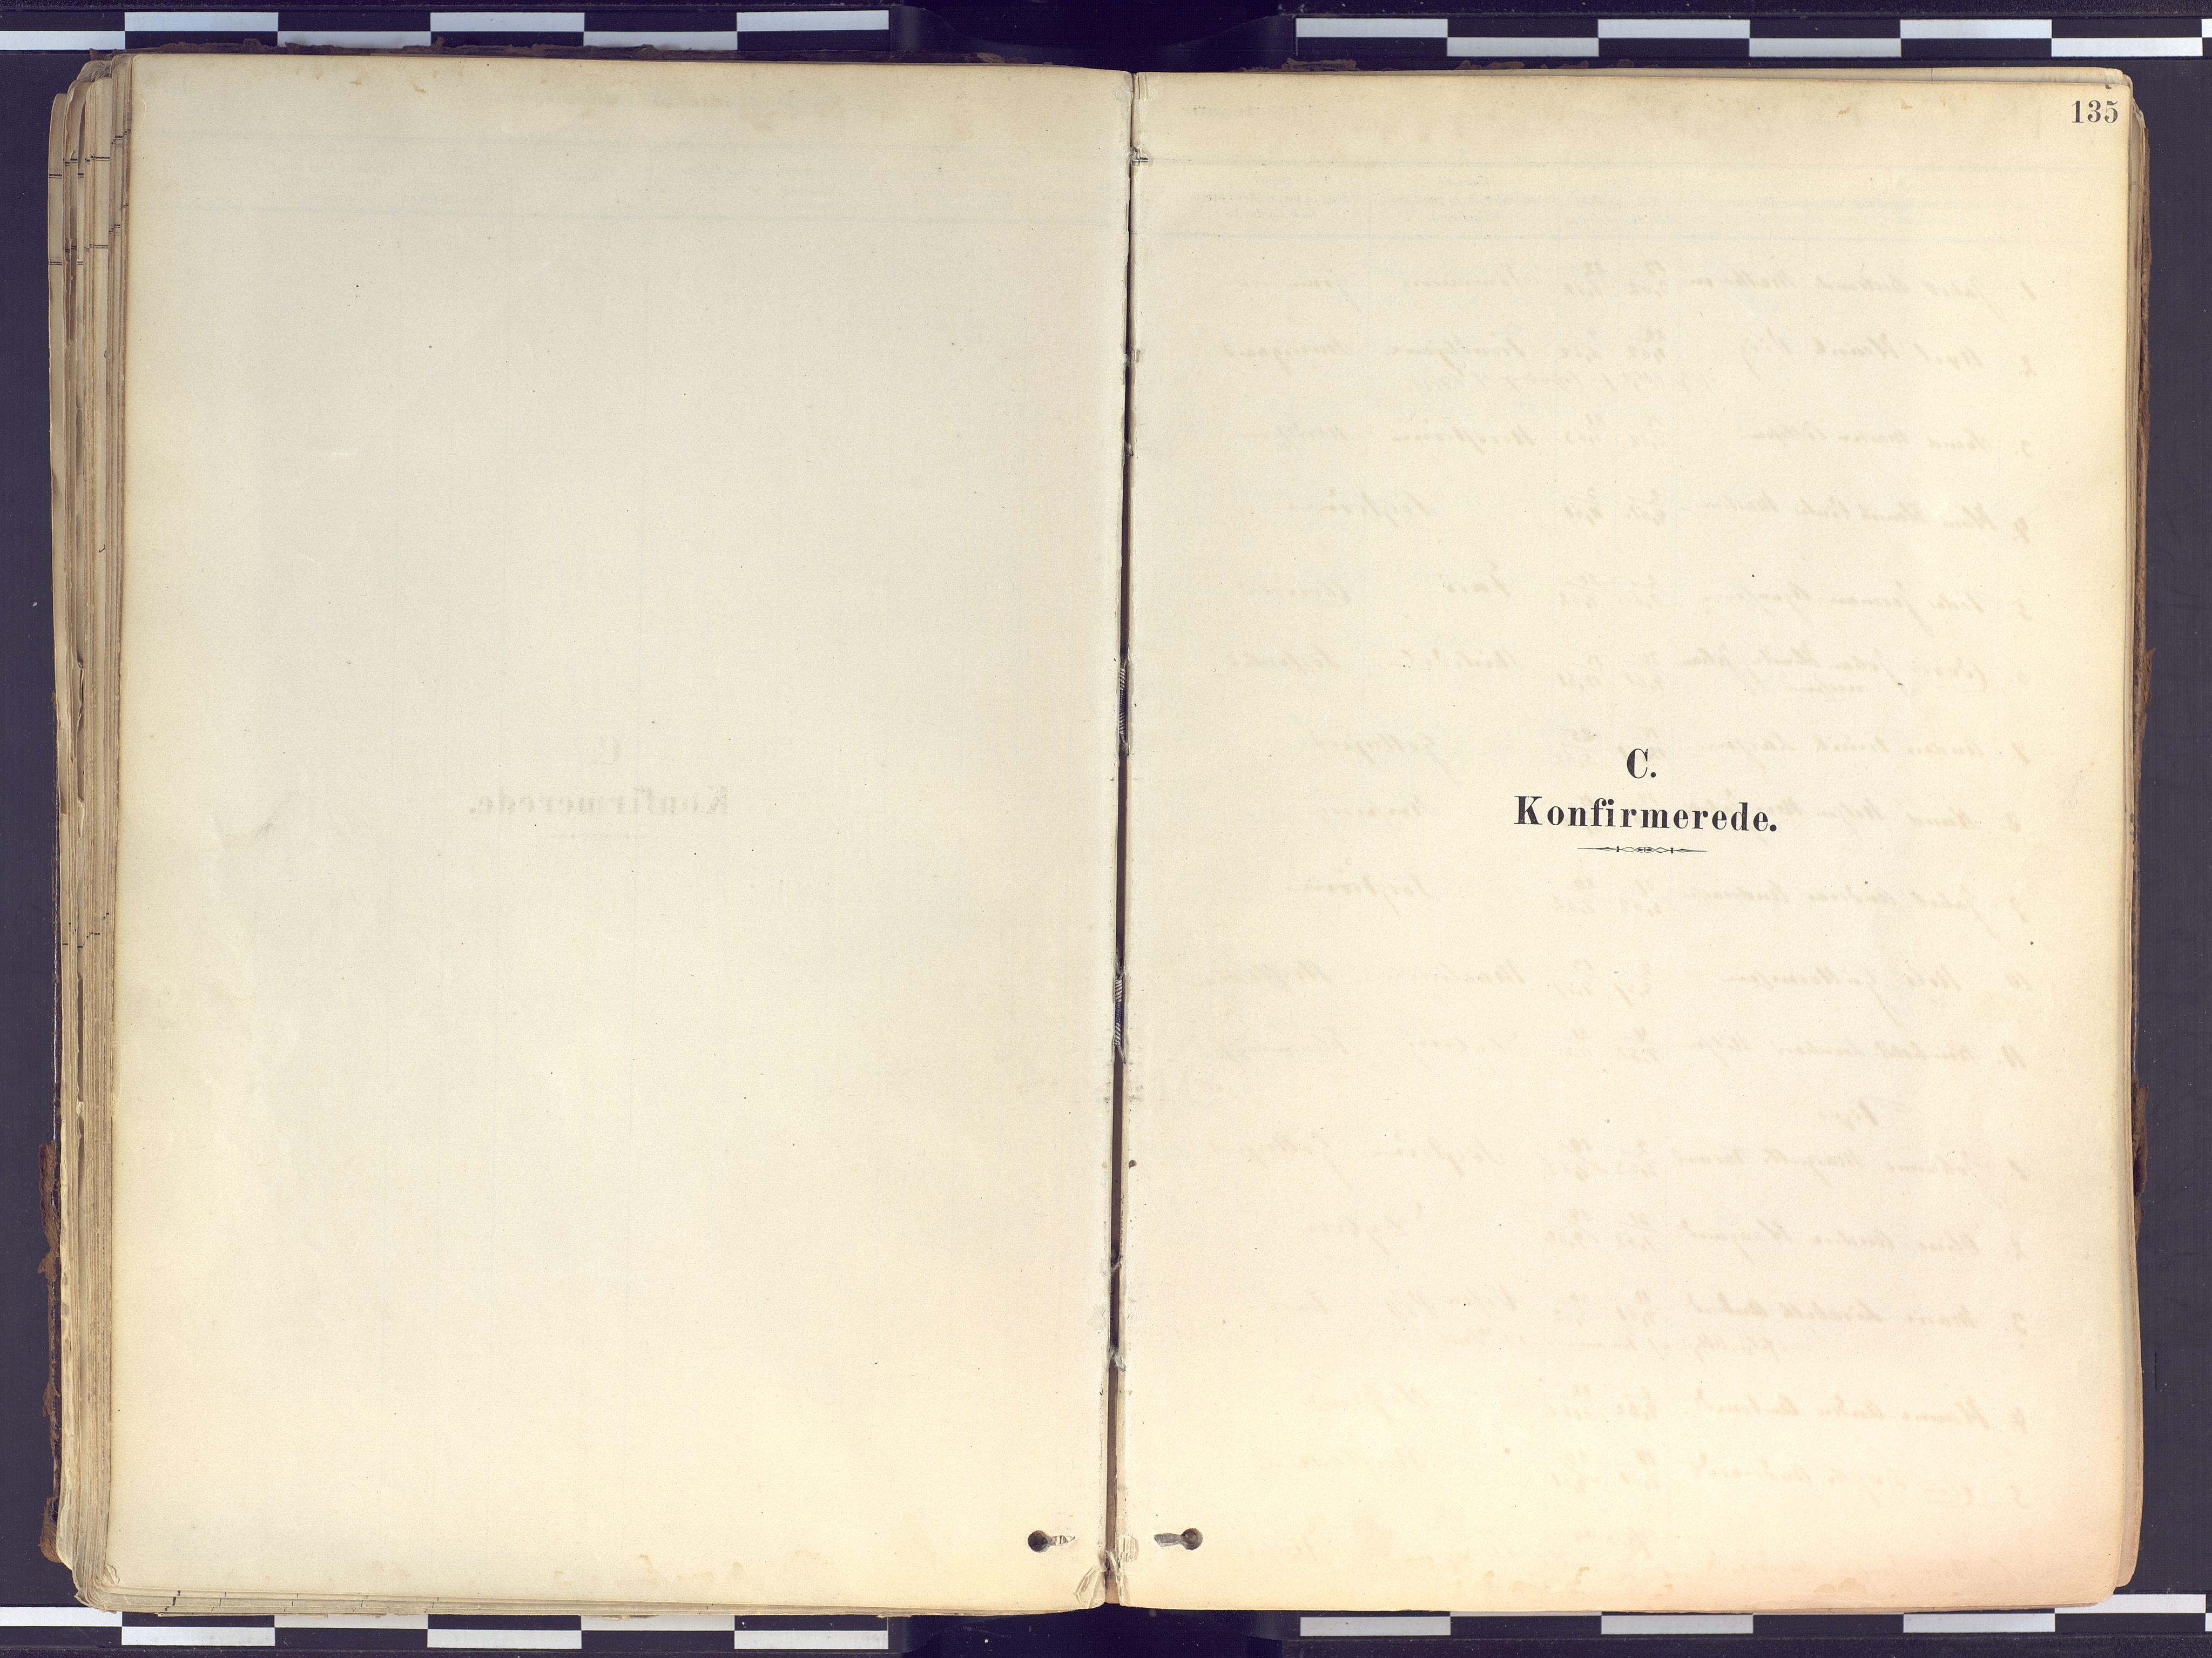 SATØ, Tranøy sokneprestkontor, I/Ia/Iaa/L0010kirke: Ministerialbok nr. 10, 1878-1904, s. 135